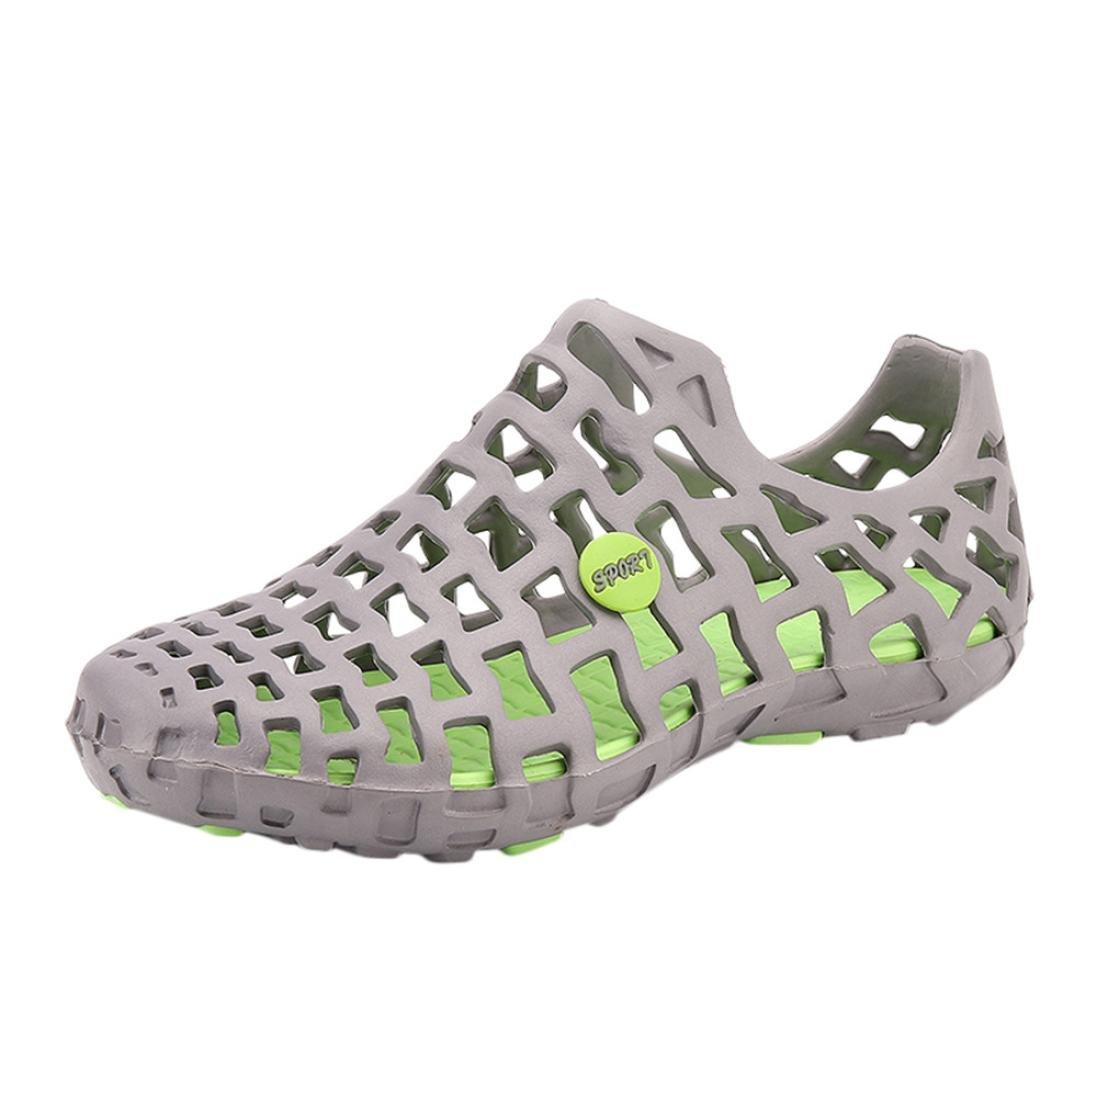 Unisexe Flip Flops Casual Sandale 19066 Sandale on à Enfiler Femme Homme,Overdose Été Chaussures Plage Tennis Slip on Sneakers Gris 358bea3 - latesttechnology.space